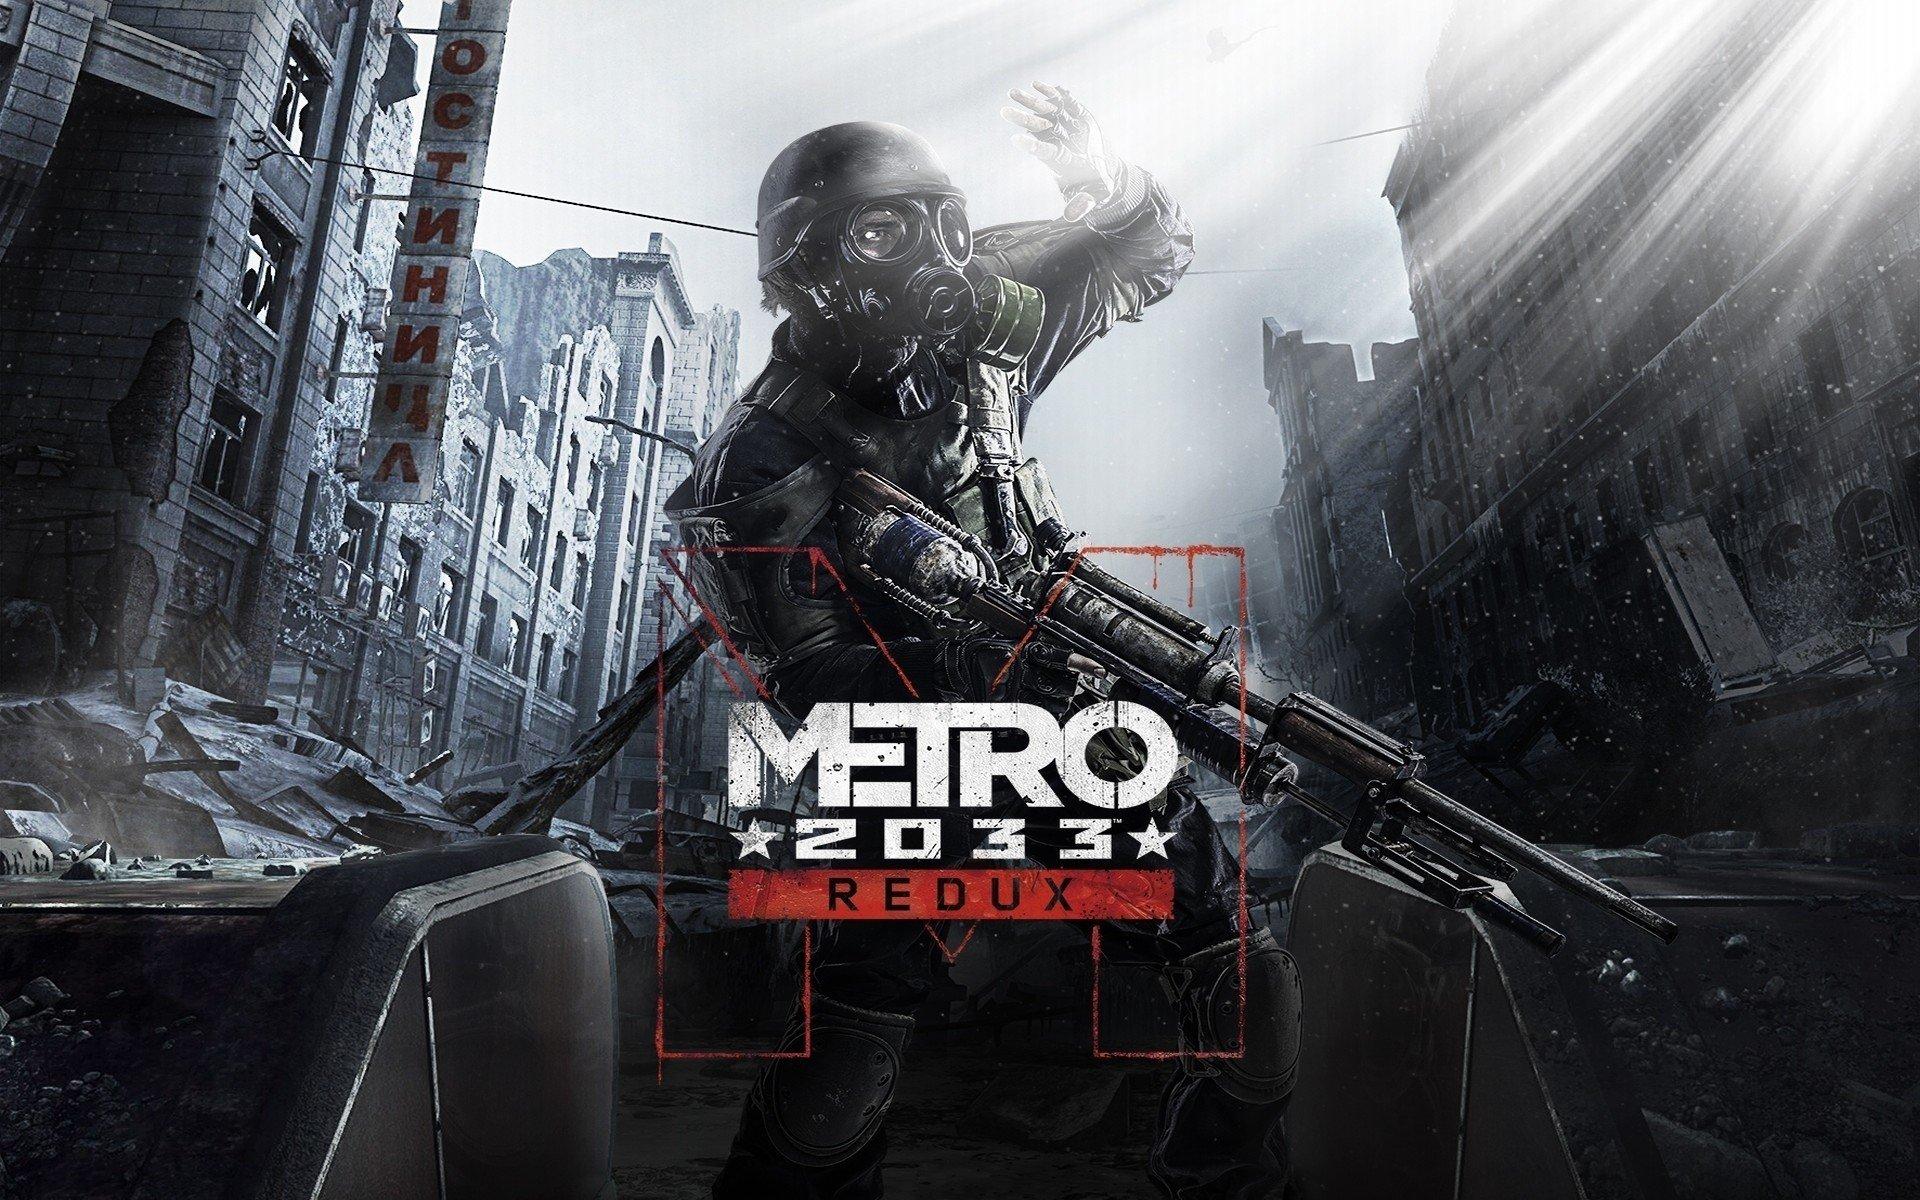 Fondos de pantalla Metro 2033 Redux